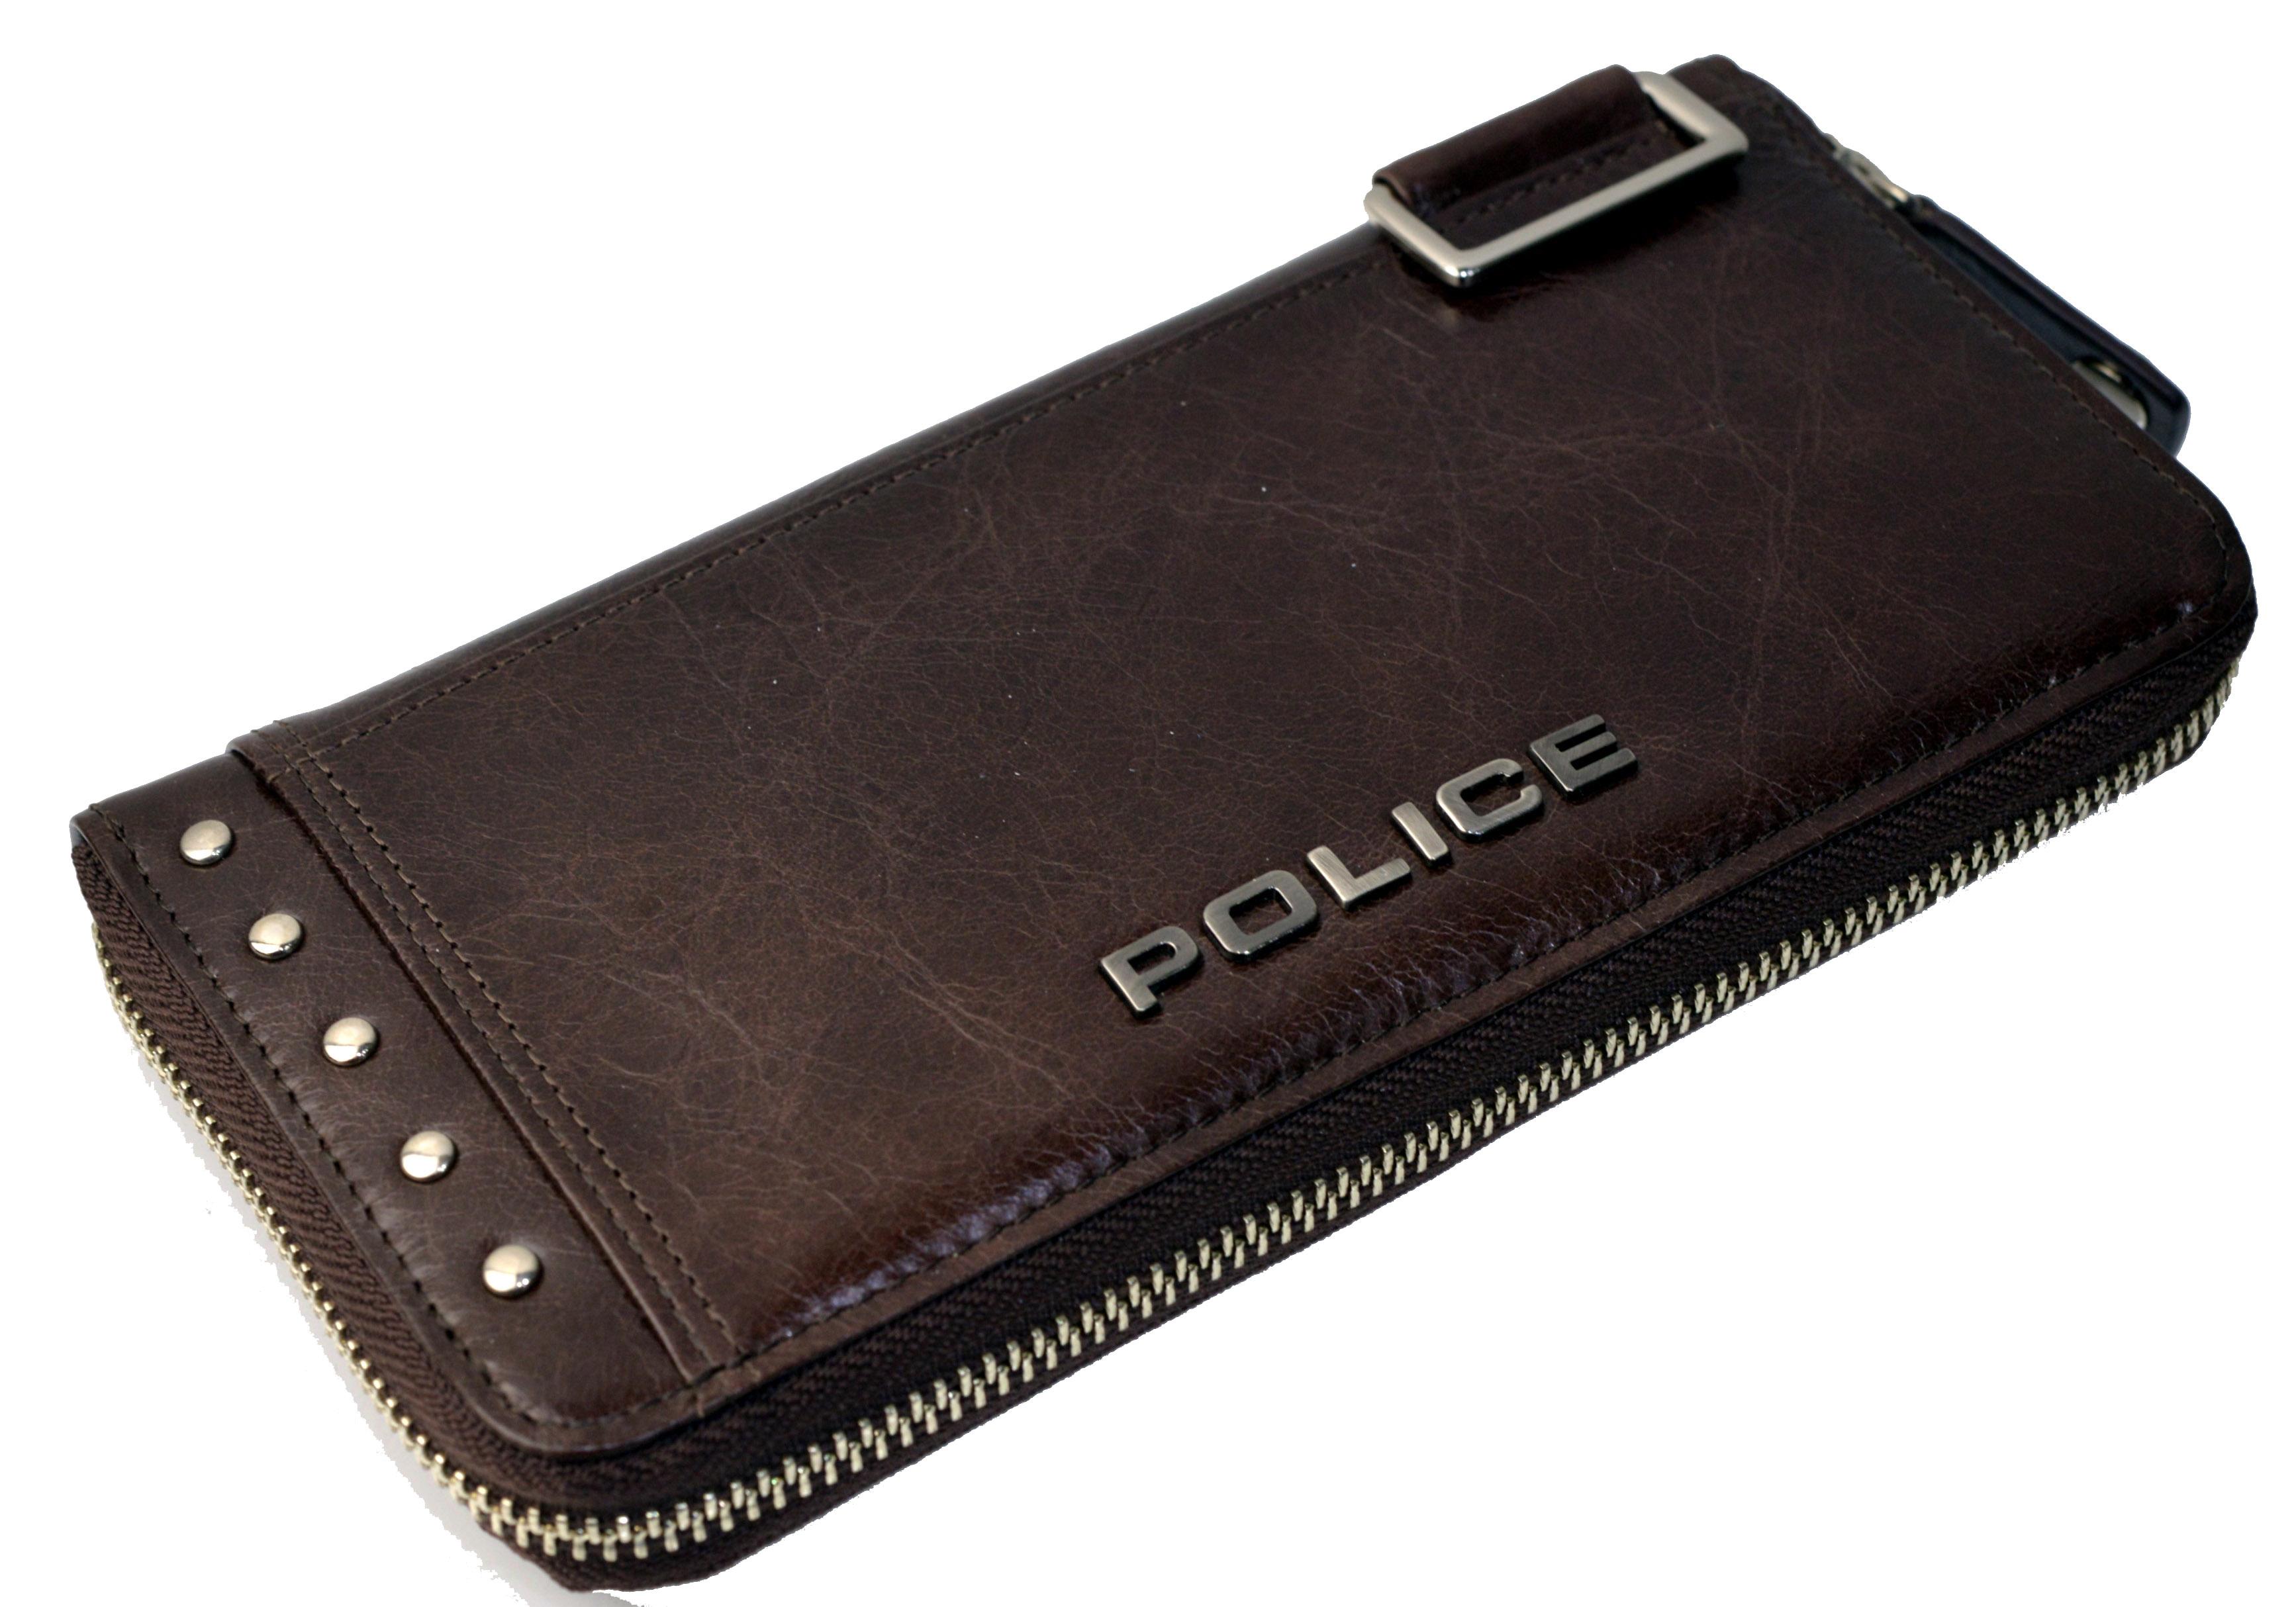 http://www.police.ne.jp/images/police_wallet_avoid2_pa-58602_29_02.jpg